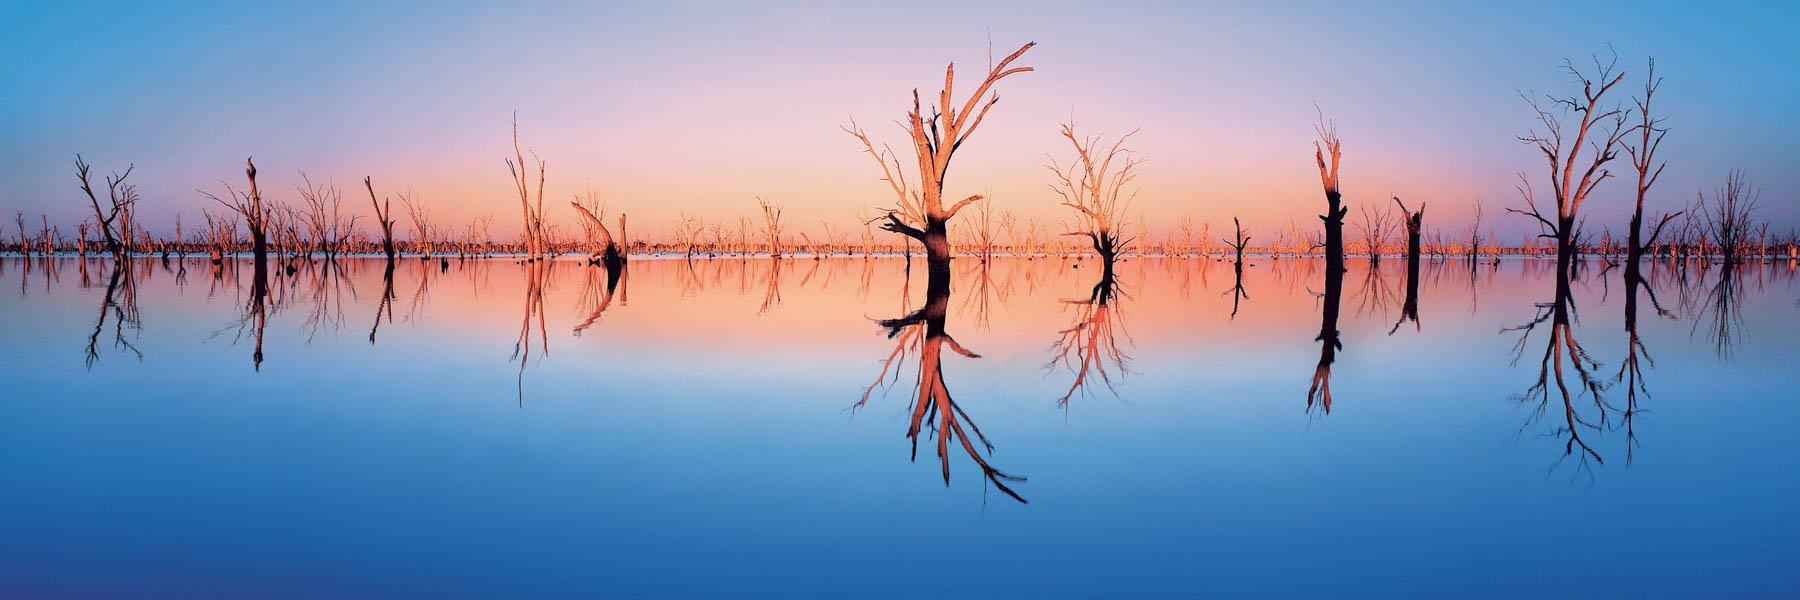 Dead trees in flooded lake Mulwala, Yarrawonga, Victoria, Australia.